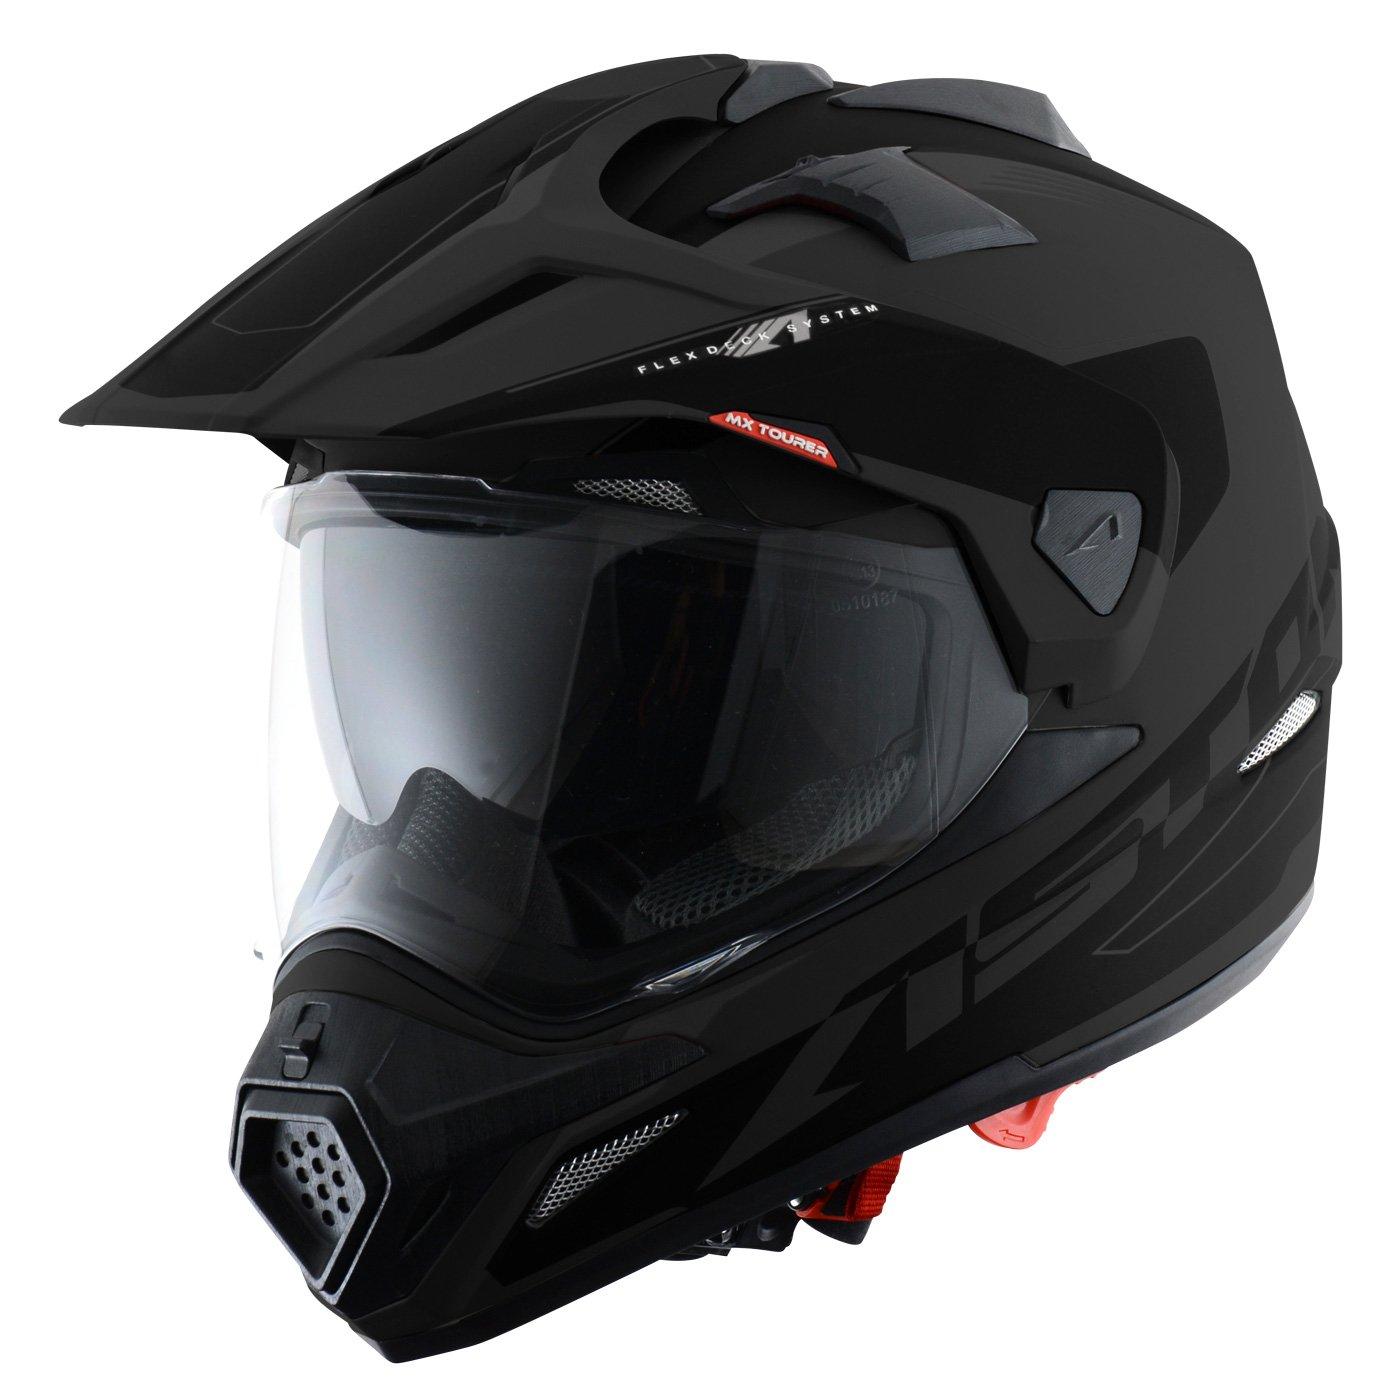 Astone Helmets TOURERM-MBKXXL Full-Face Cross Tourer Motorcycle Helmet